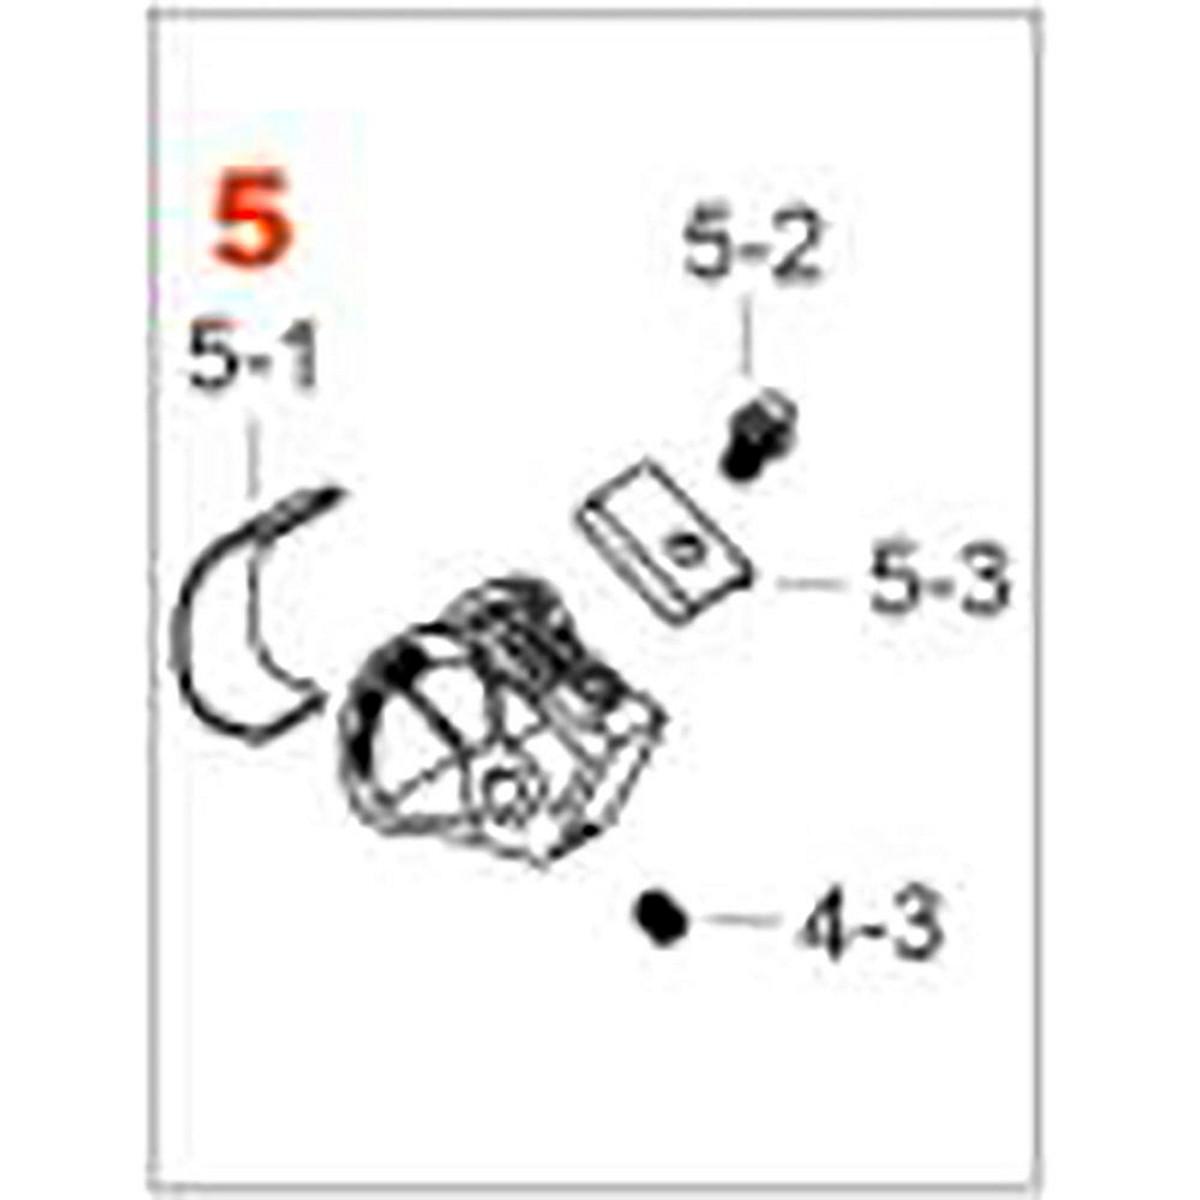 TAMA HP9N5R - CAMMA LITESPROKET PEDALE SPEED COBRA E IRON COBRA ROLLING (PER MODELLI DAL 2016)